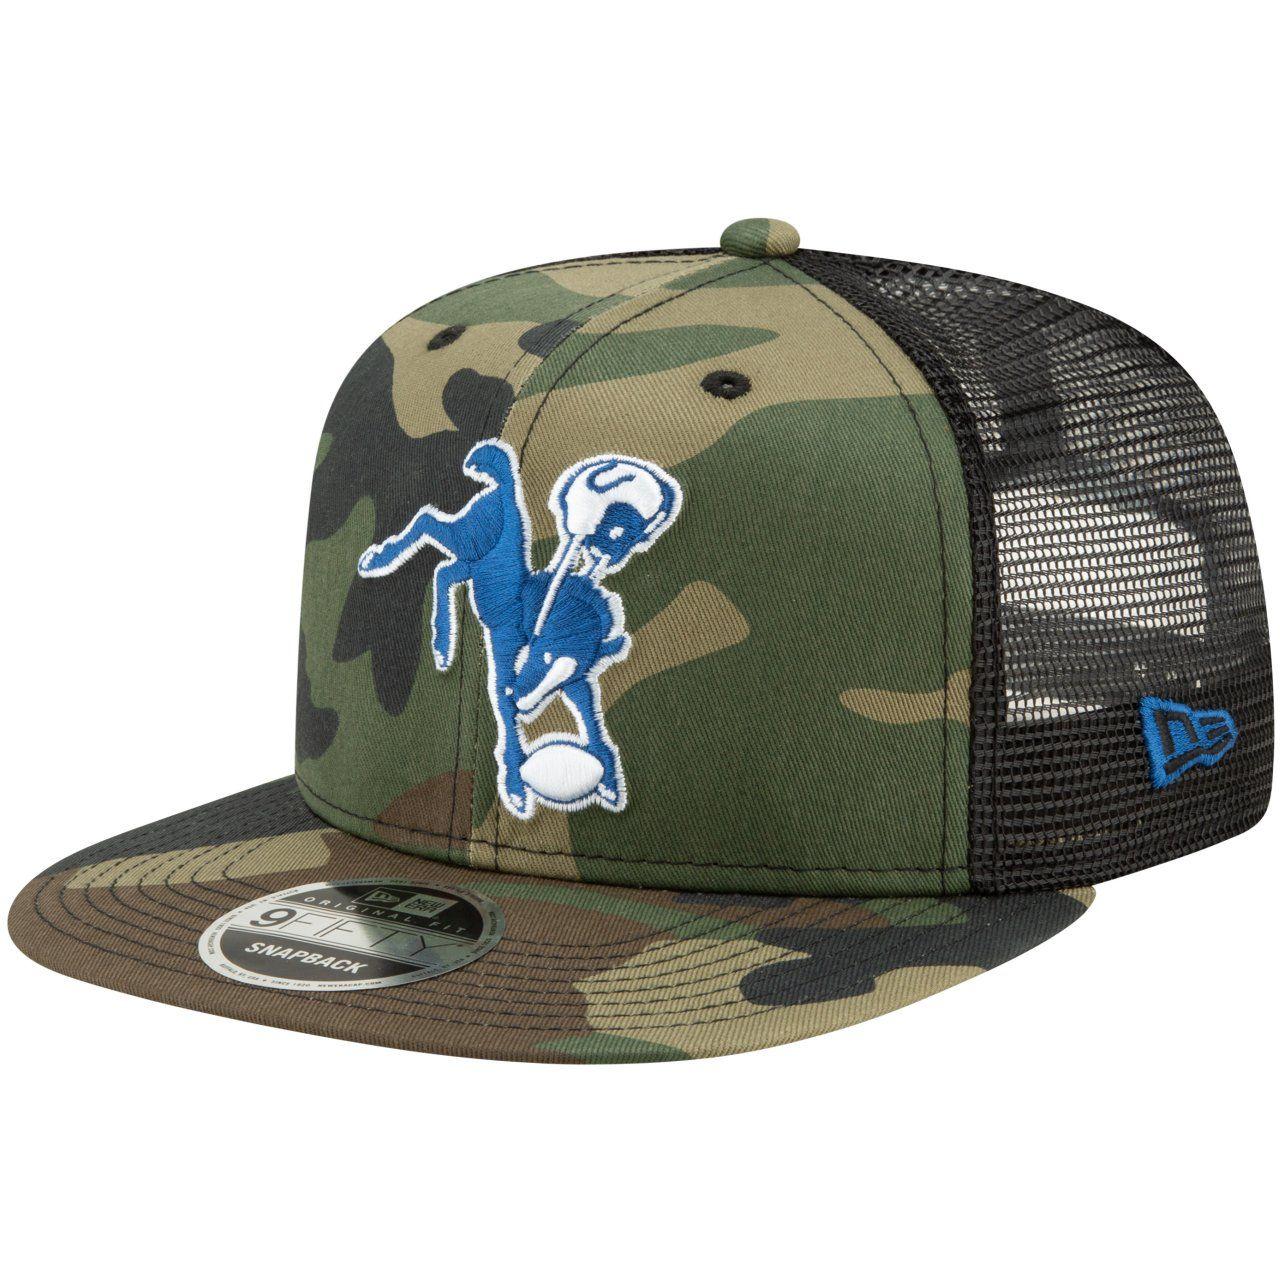 amfoo - Throwback Baltimore Colts Mesh 9Fifty Snapback Cap wood camo